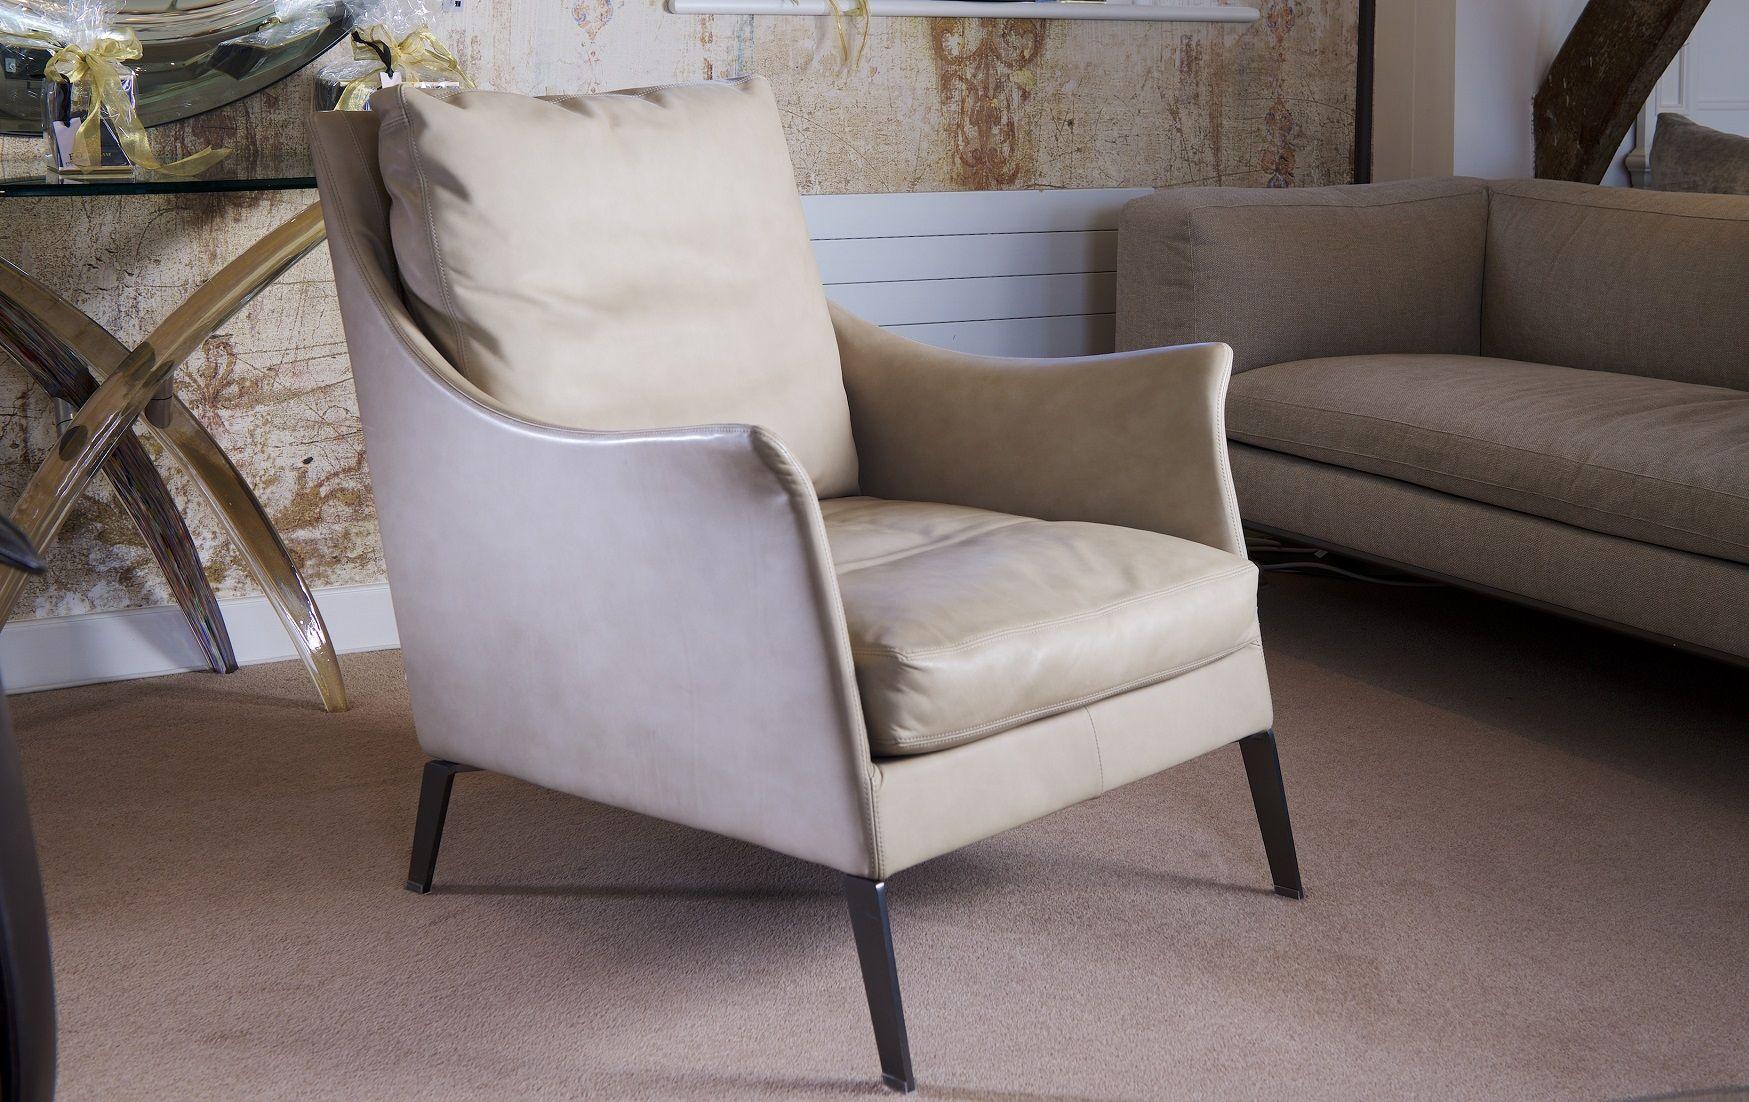 Colombo Divani A Meda boss armchair | studio italia